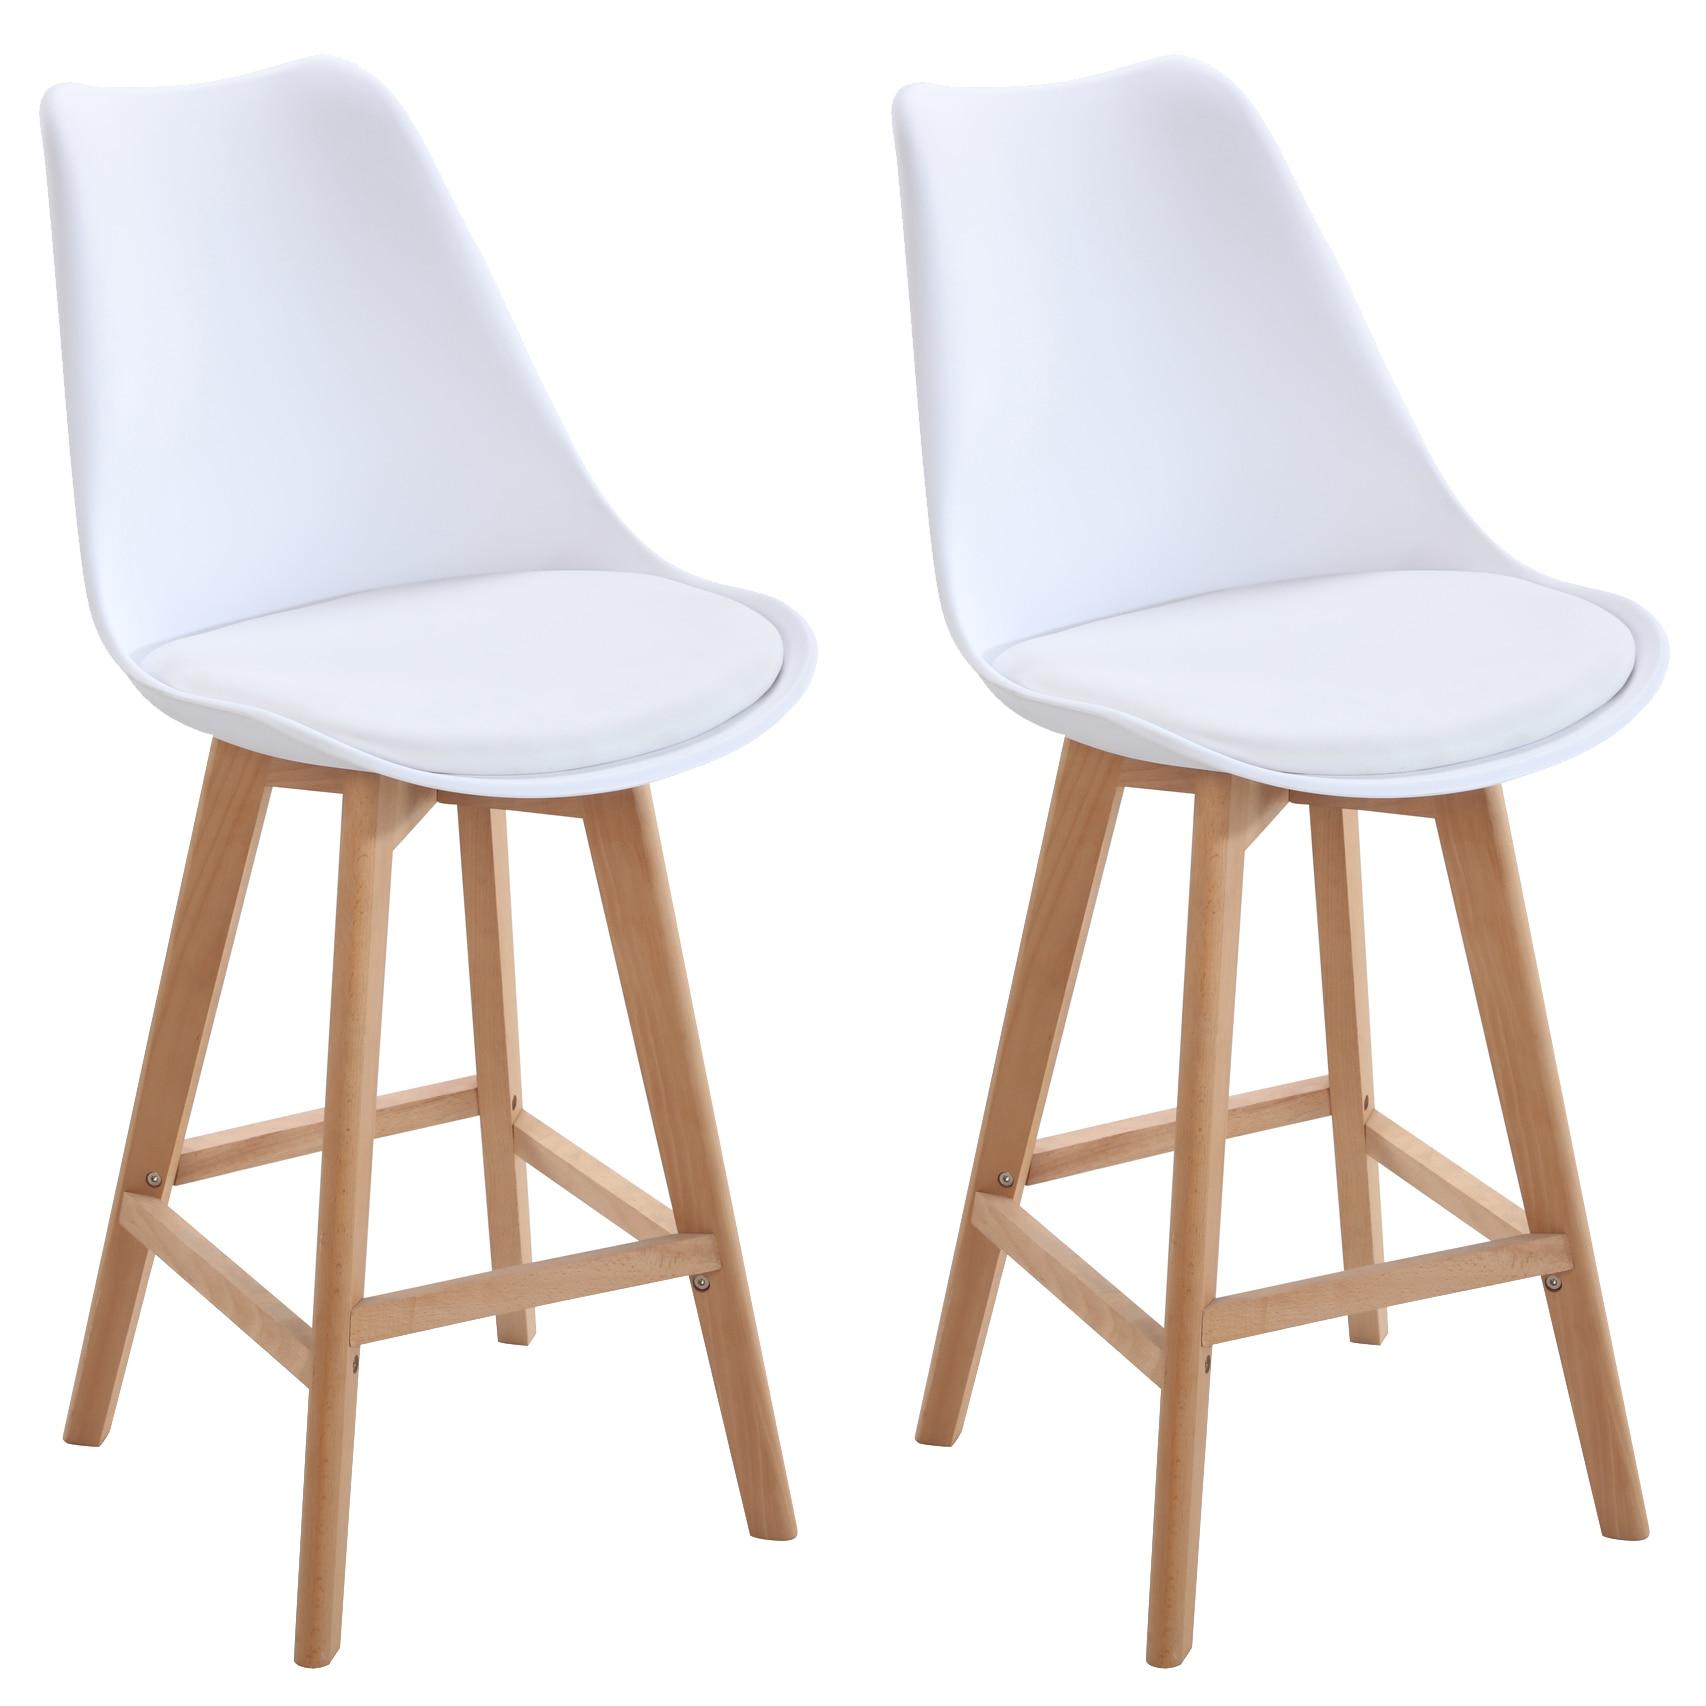 Fotografie Set 2 scaune bar Itsy Heinner Home, piele ecologica, picioare lemn, Alb